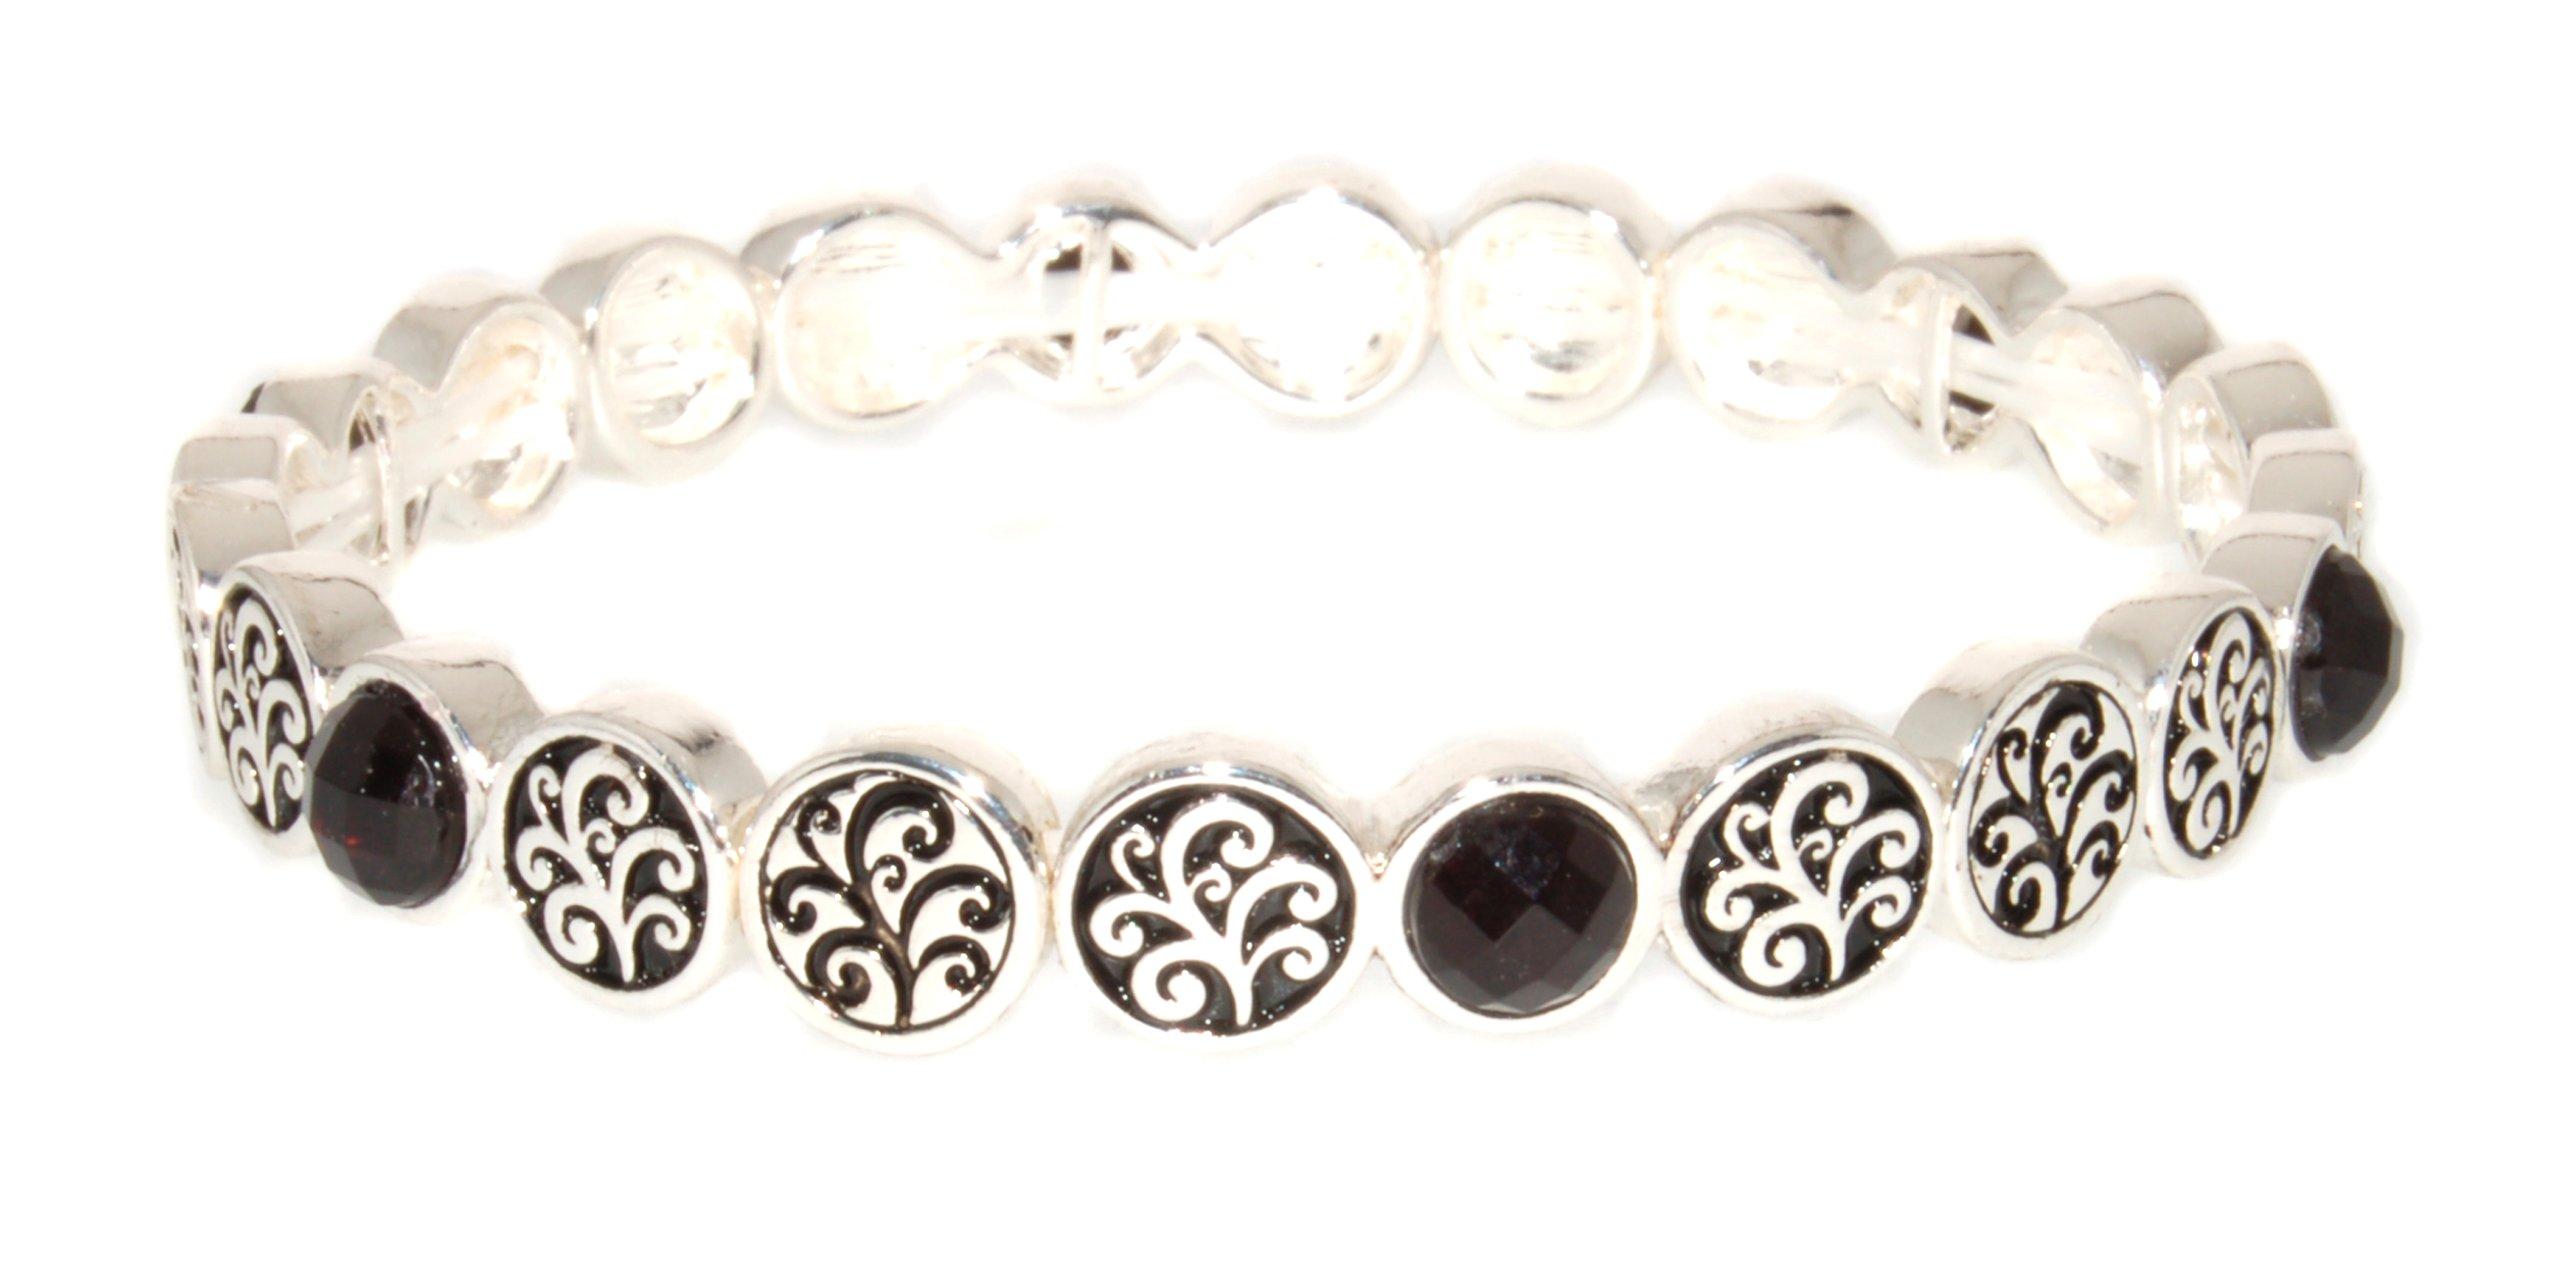 Landau Stretch Bracelet with Scroll Discs and Black Stones, Silvertone